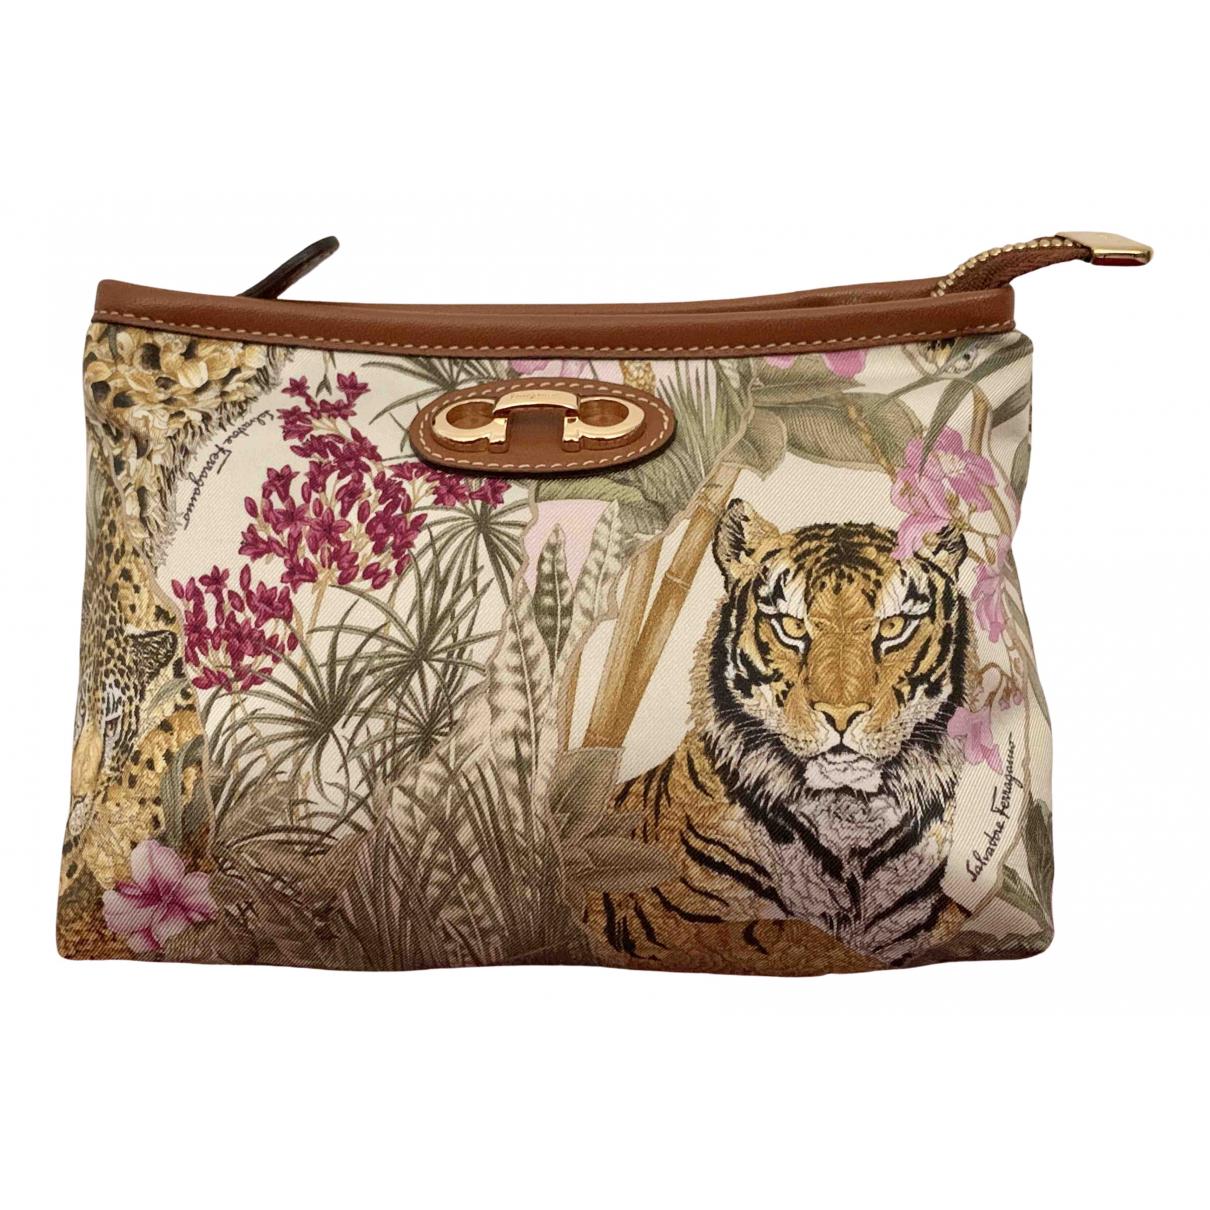 Salvatore Ferragamo N Multicolour Cloth Clutch bag for Women N